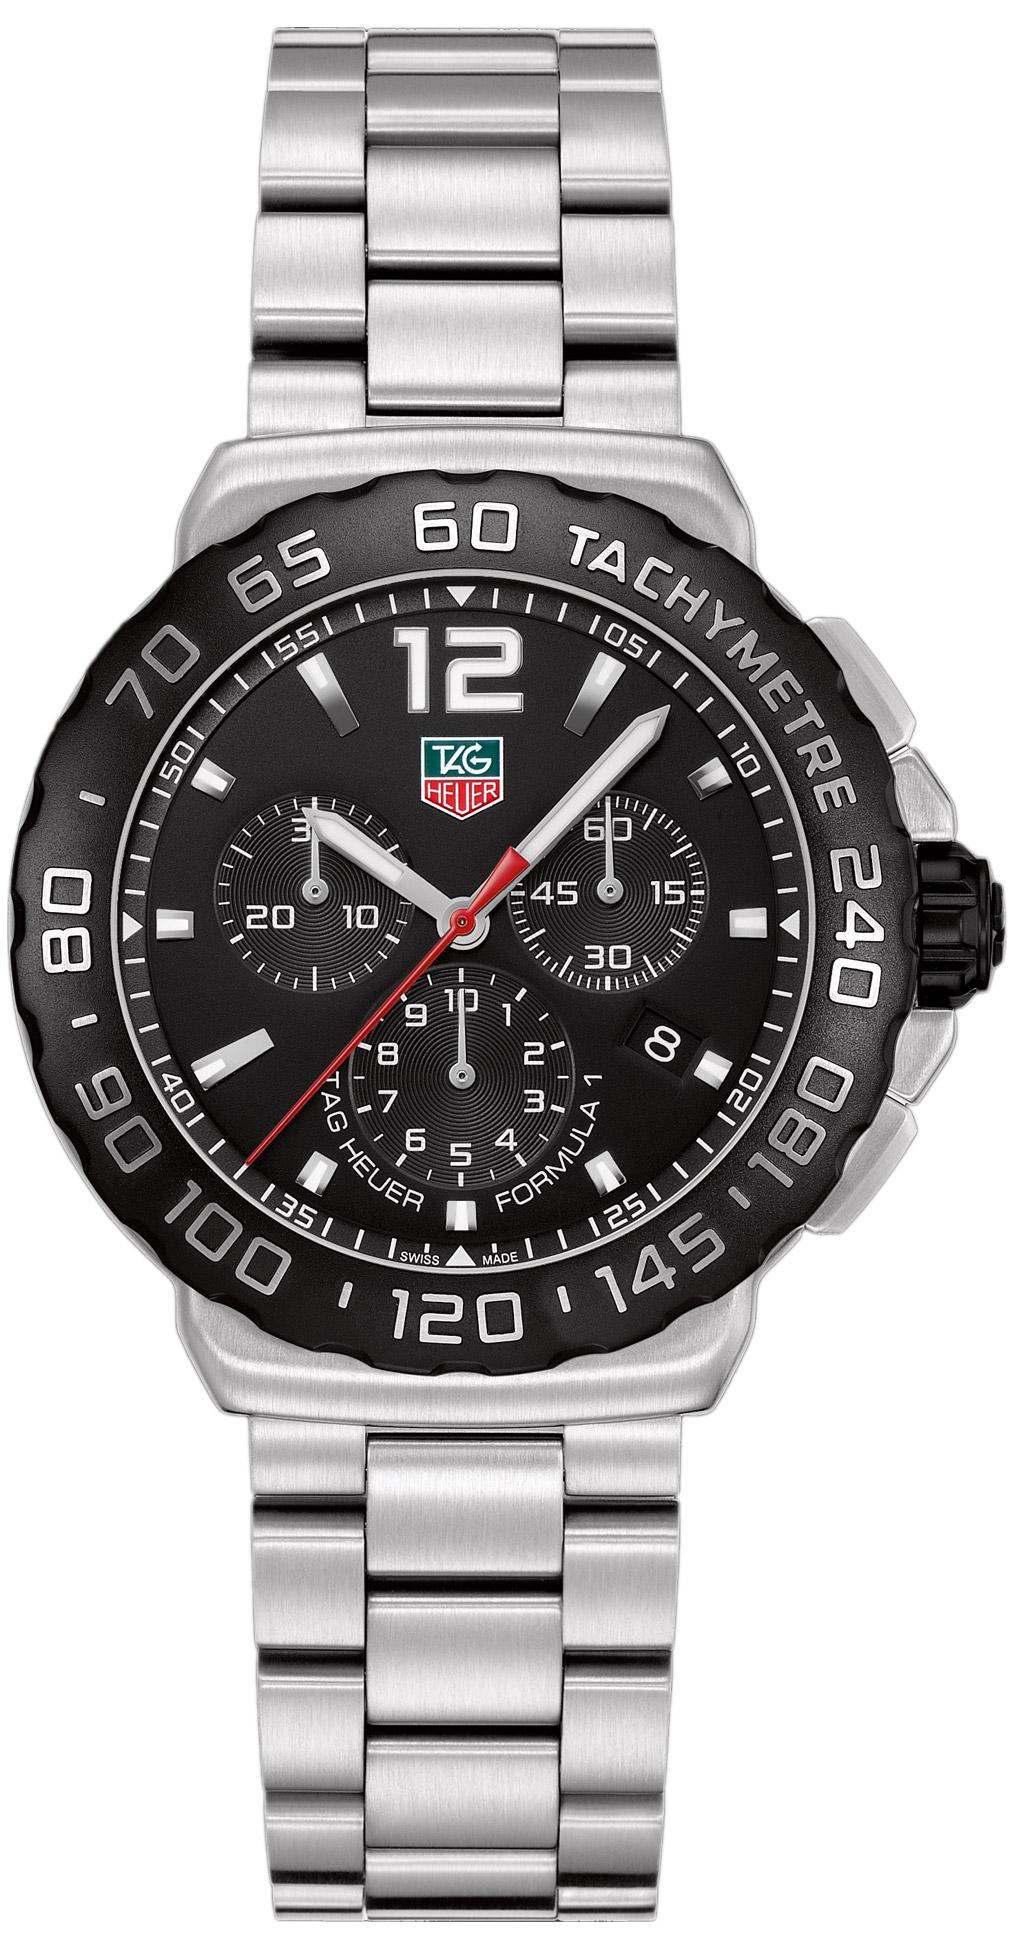 tag heuer formula 1 chronograph 42mm men s watch model cau1110 ba0858 tag heuer formula 1 chronograph 42mm men s watch